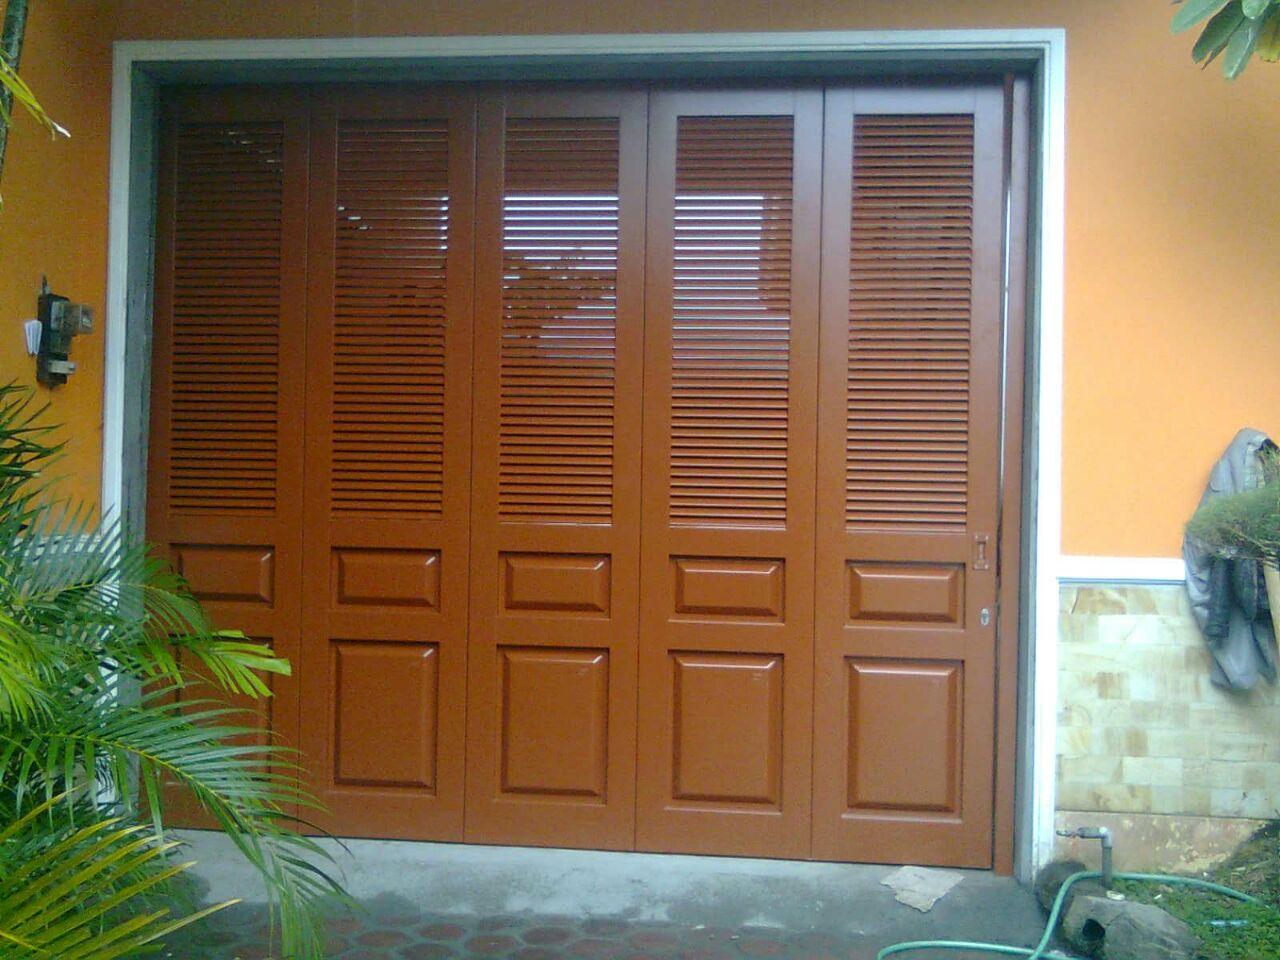 Harga Pintu Garasi Besi Terbaru - Pintu Lipat